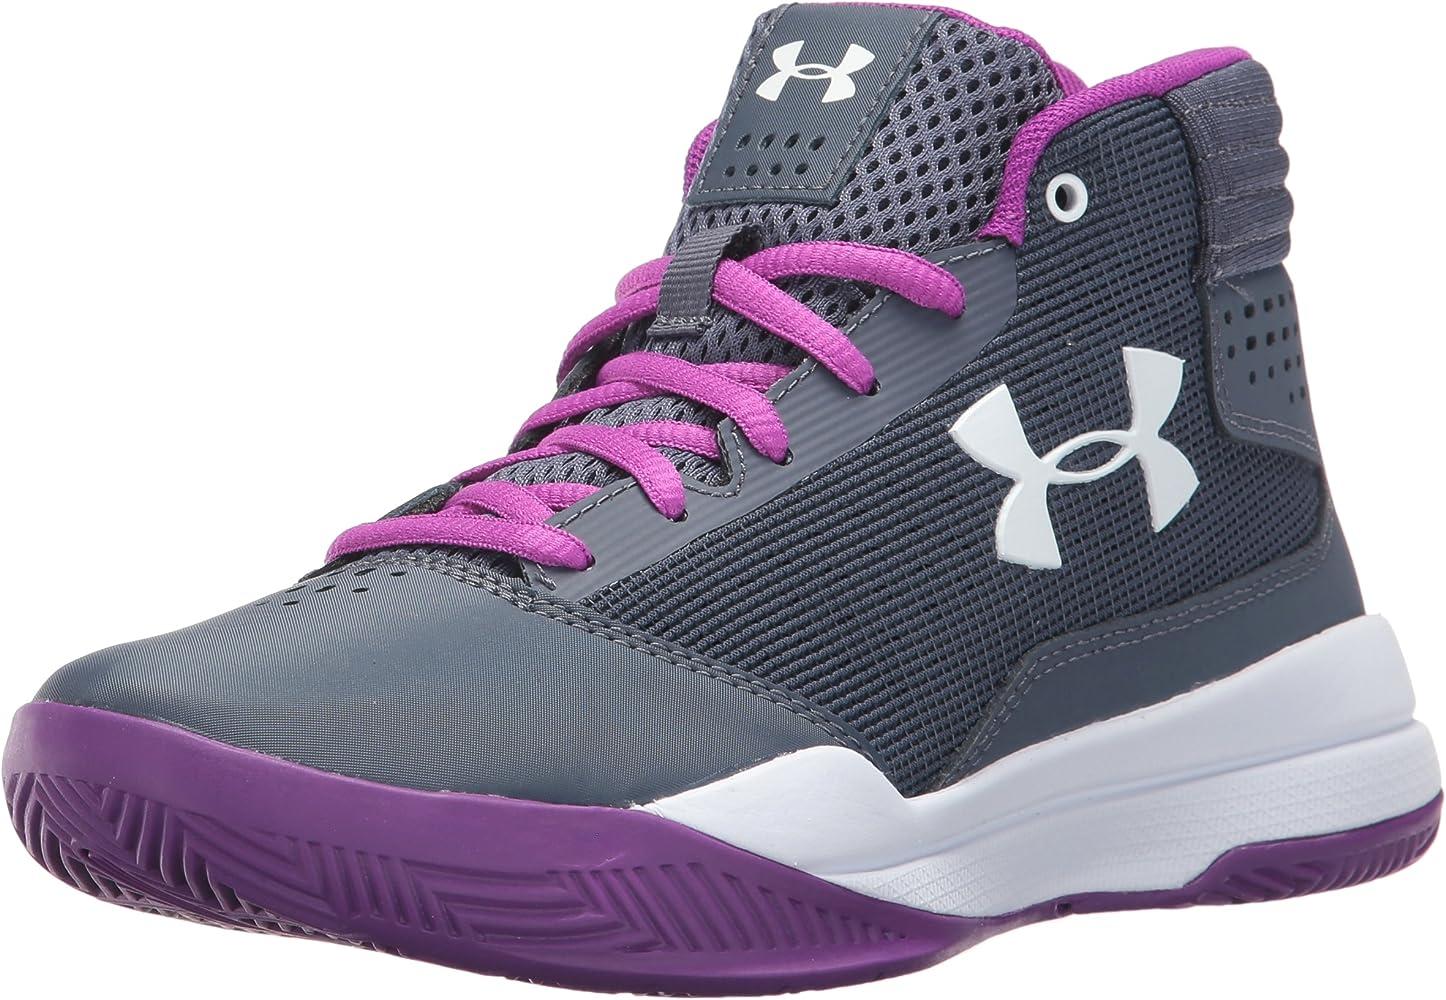 Grade School 2017 Basketball Shoe